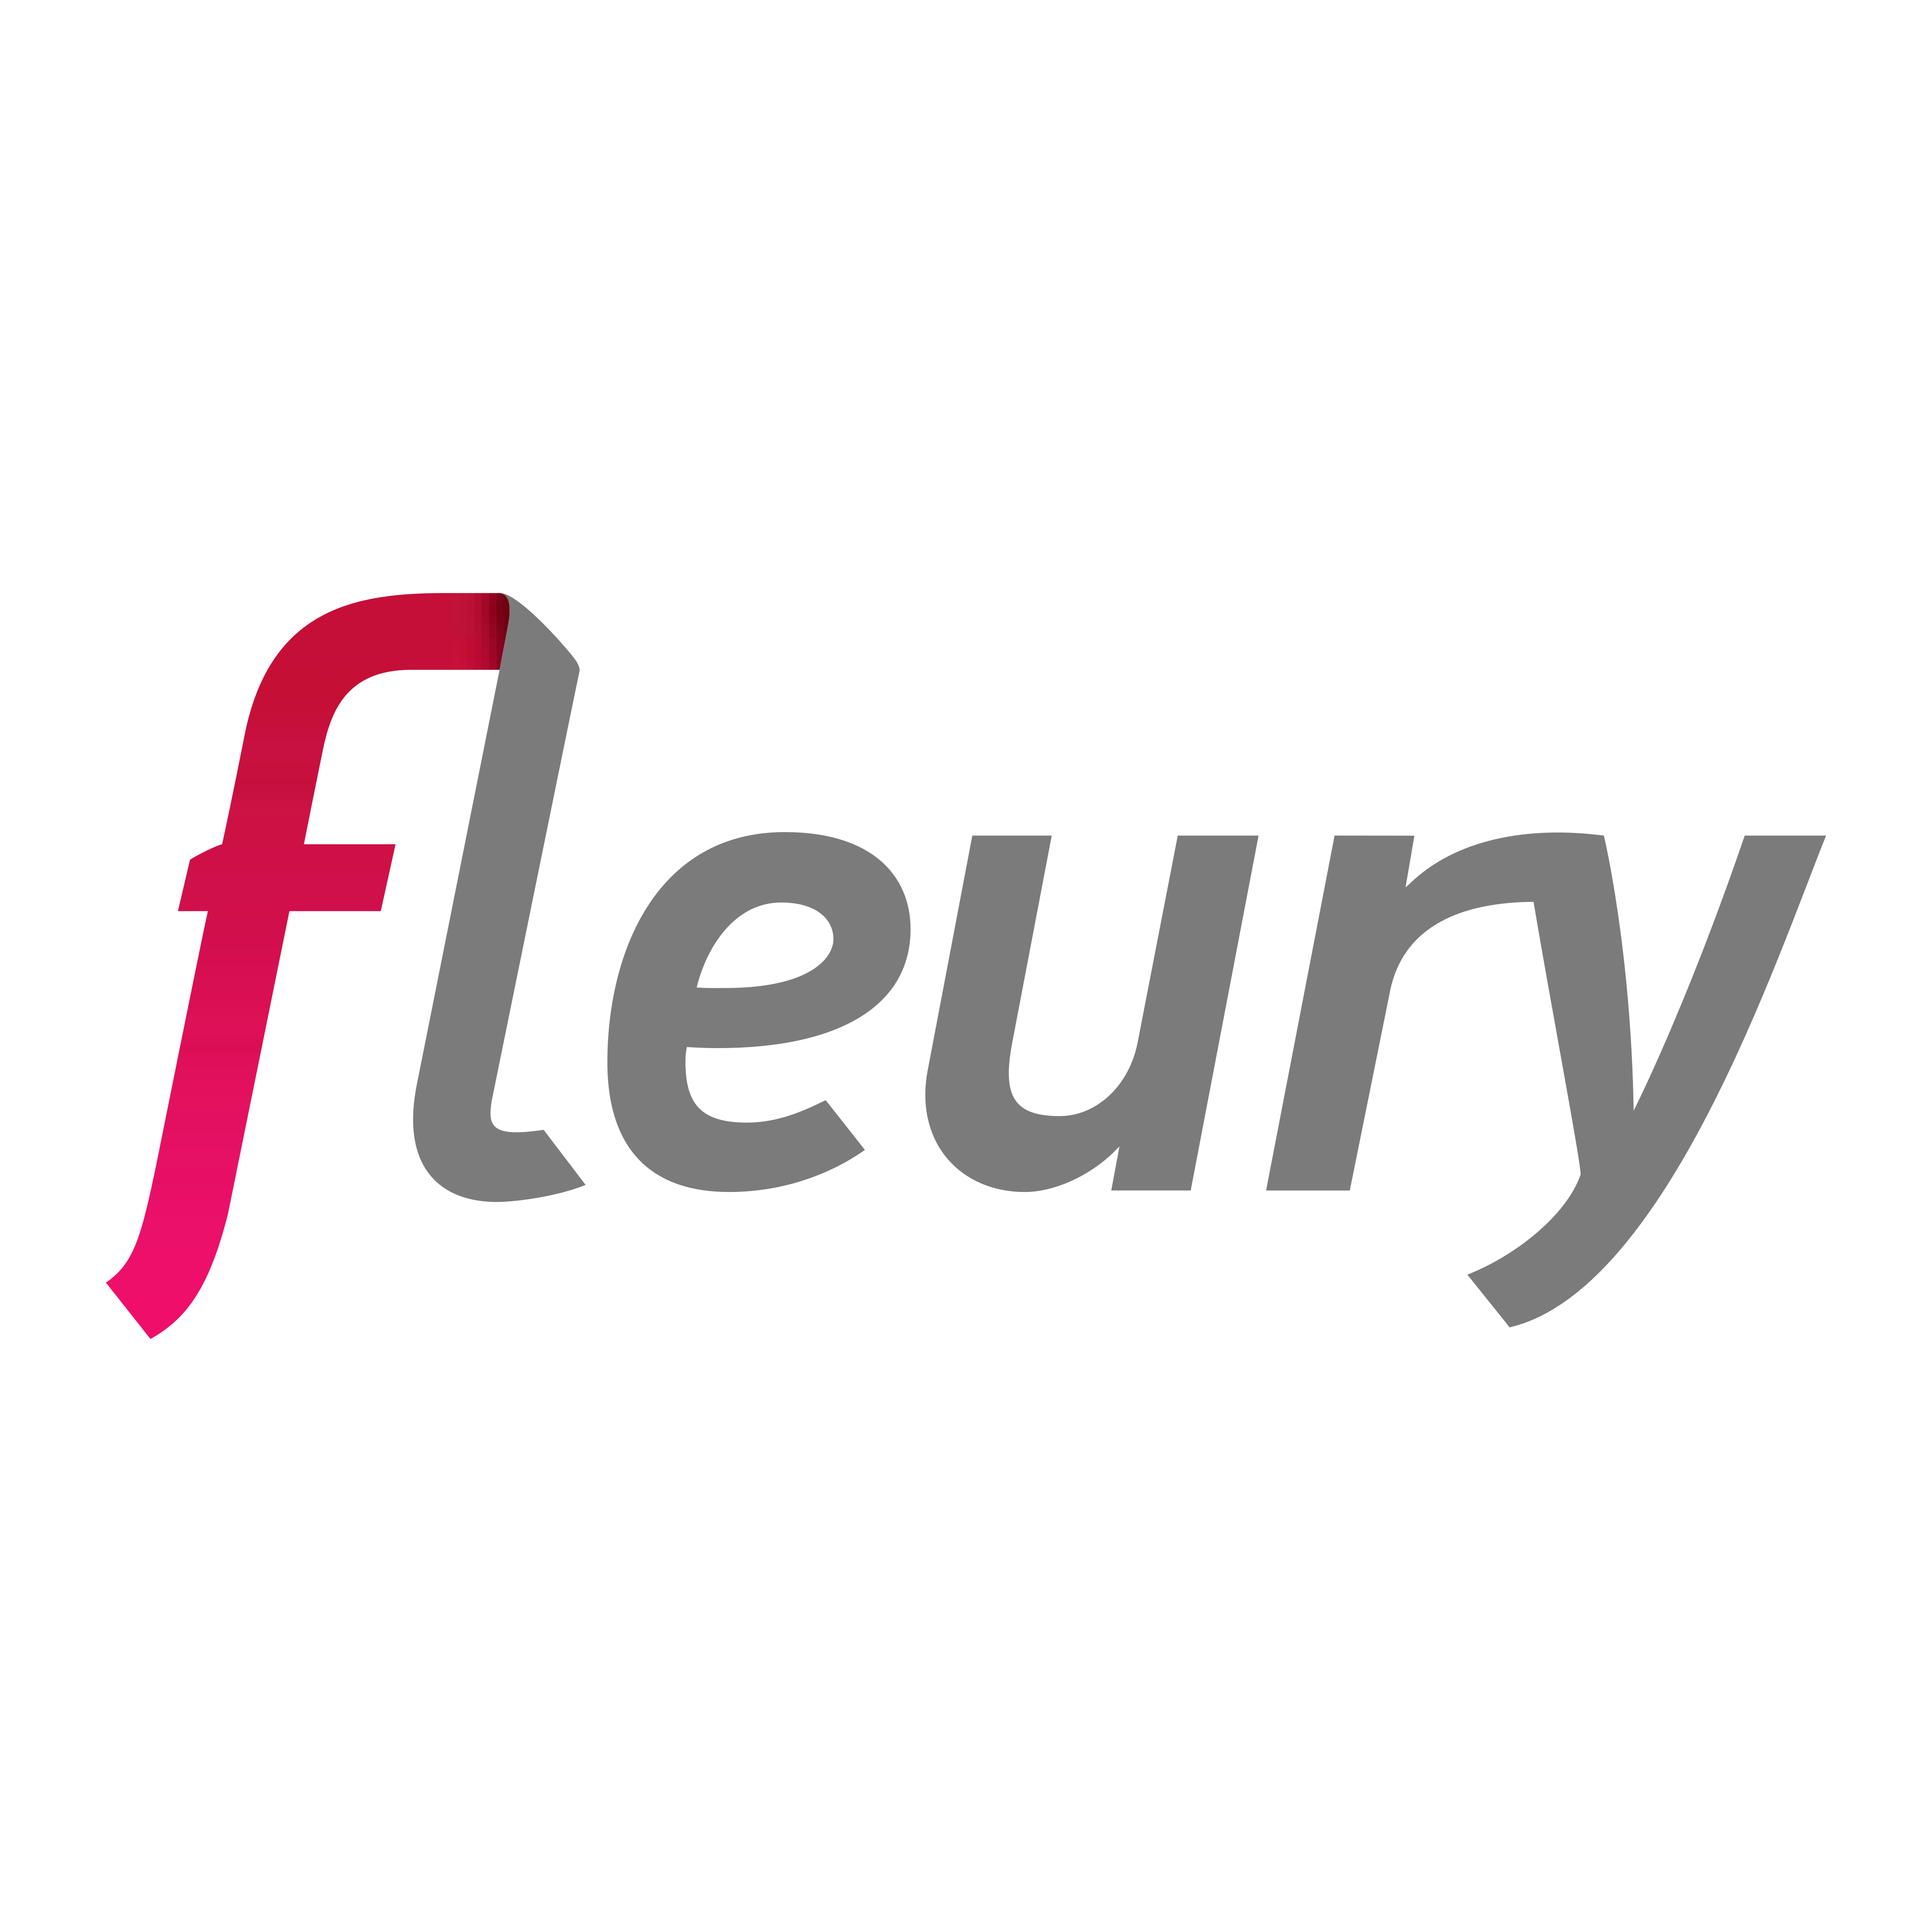 fleury-logo-0